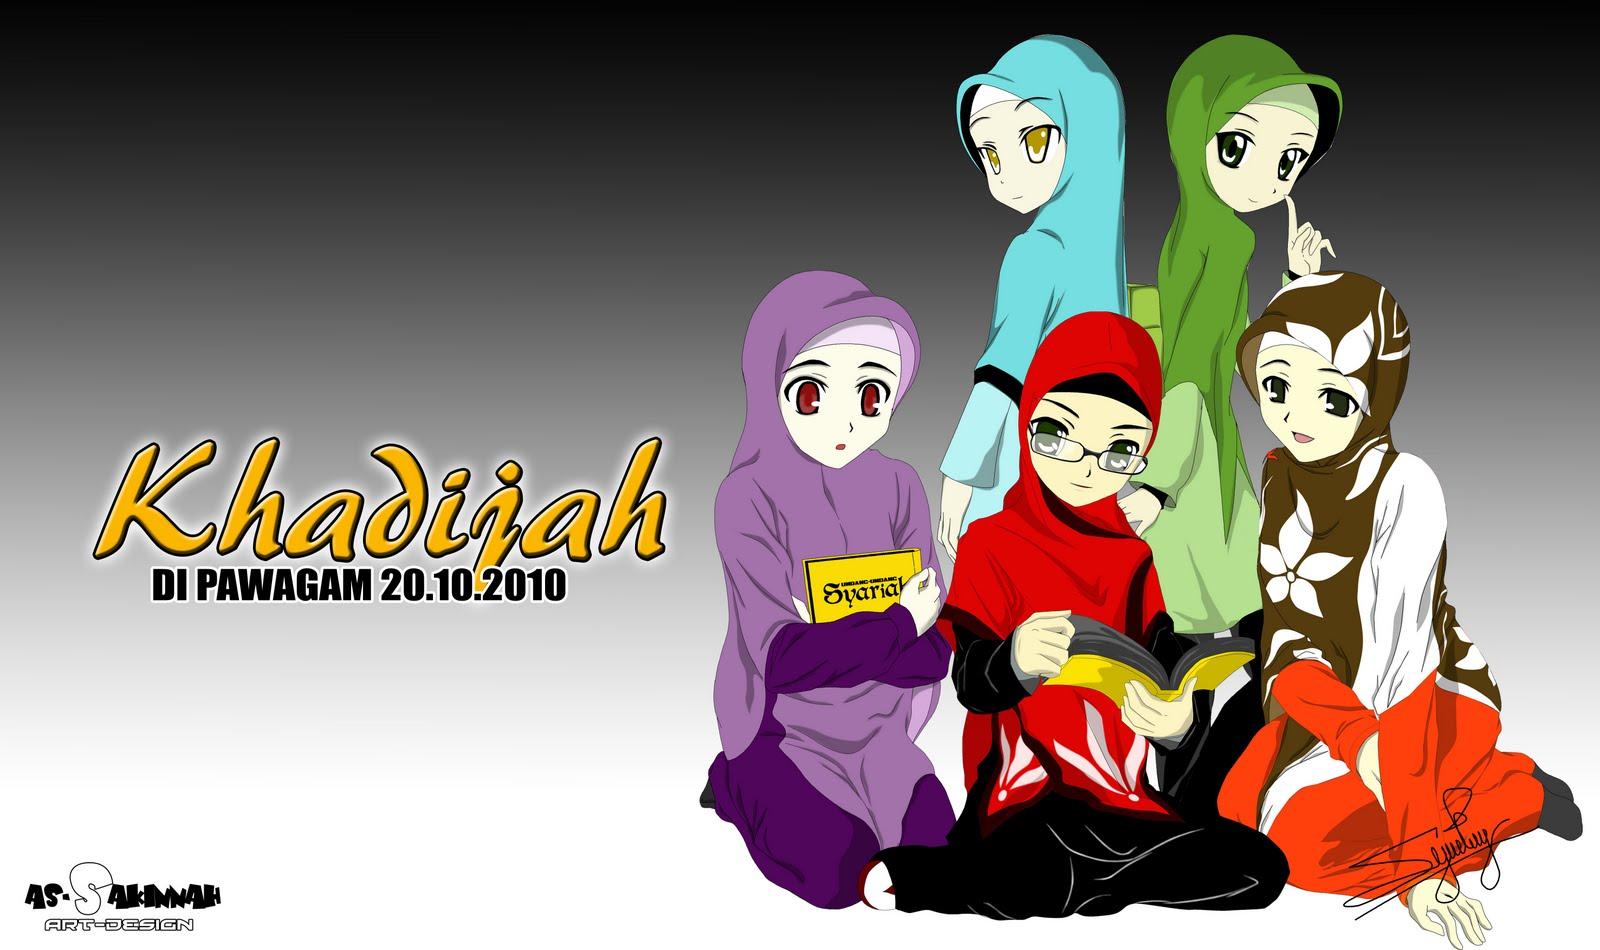 http://2.bp.blogspot.com/-pQBdmxCSoog/Tdi5HFpAX5I/AAAAAAAAAAQ/c6by5_Xc5bI/s1600/Wallpaper_Muslimah_Complete.jpg